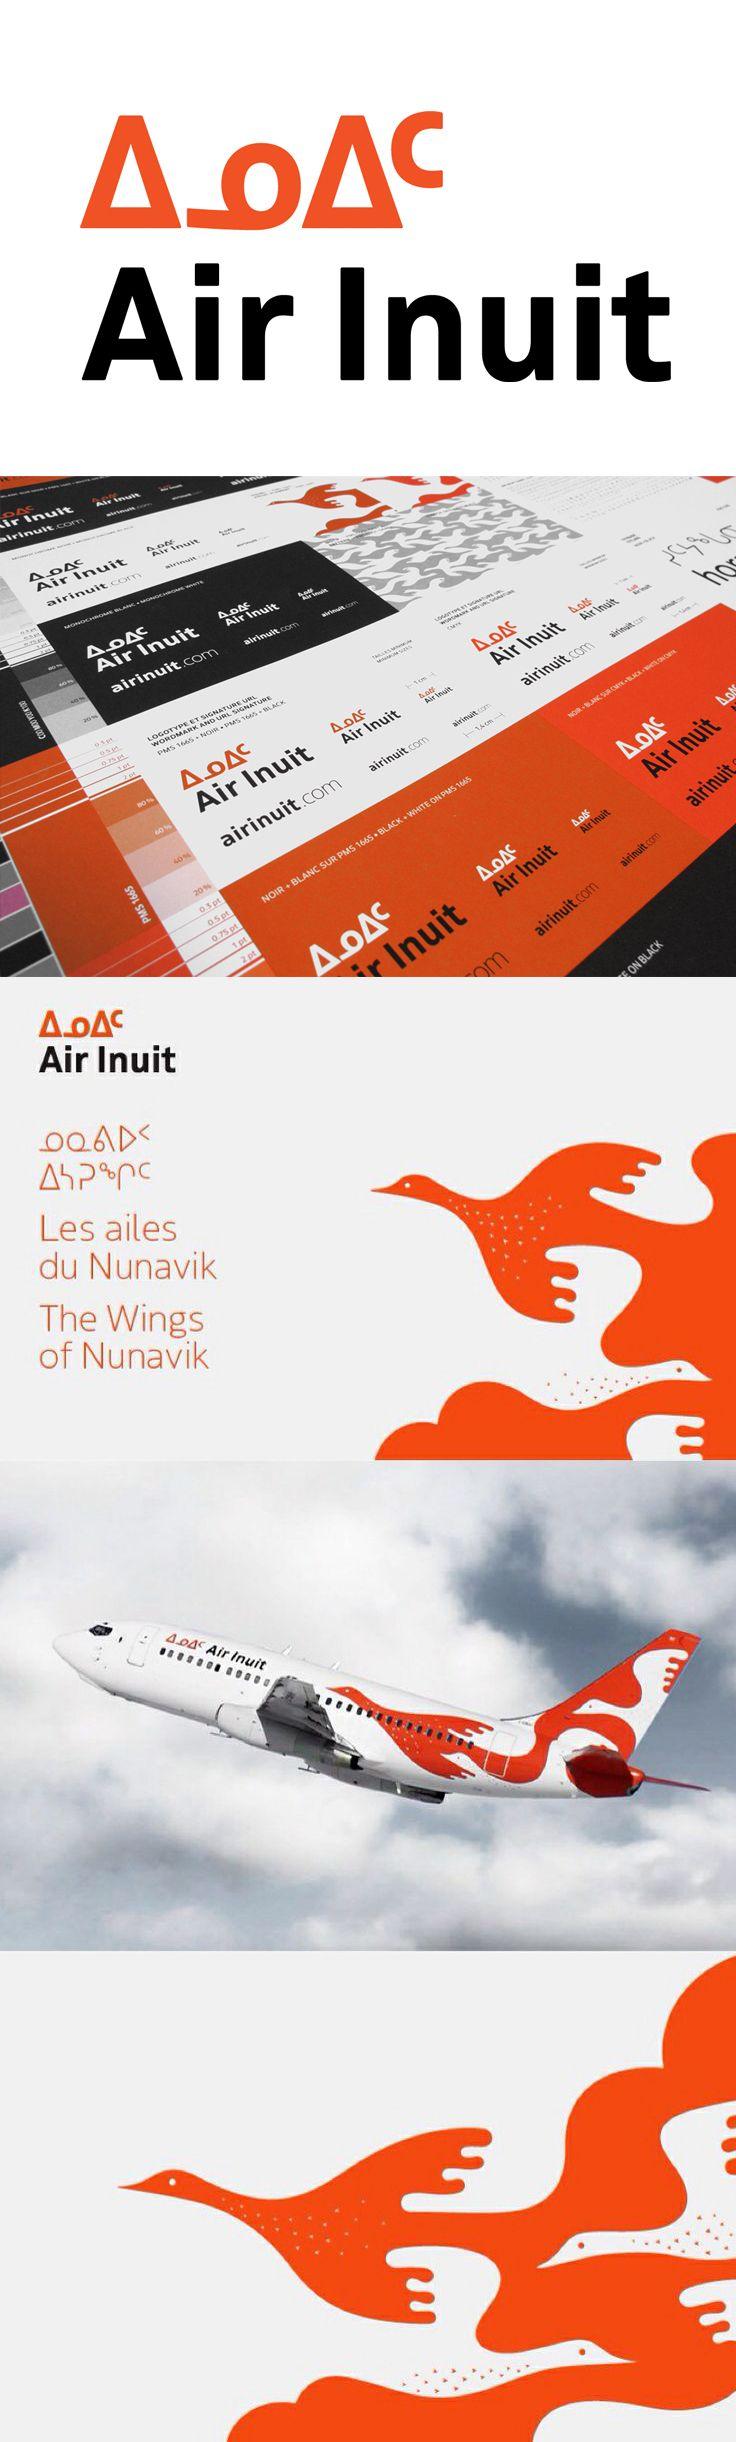 Air Inuit - Feed